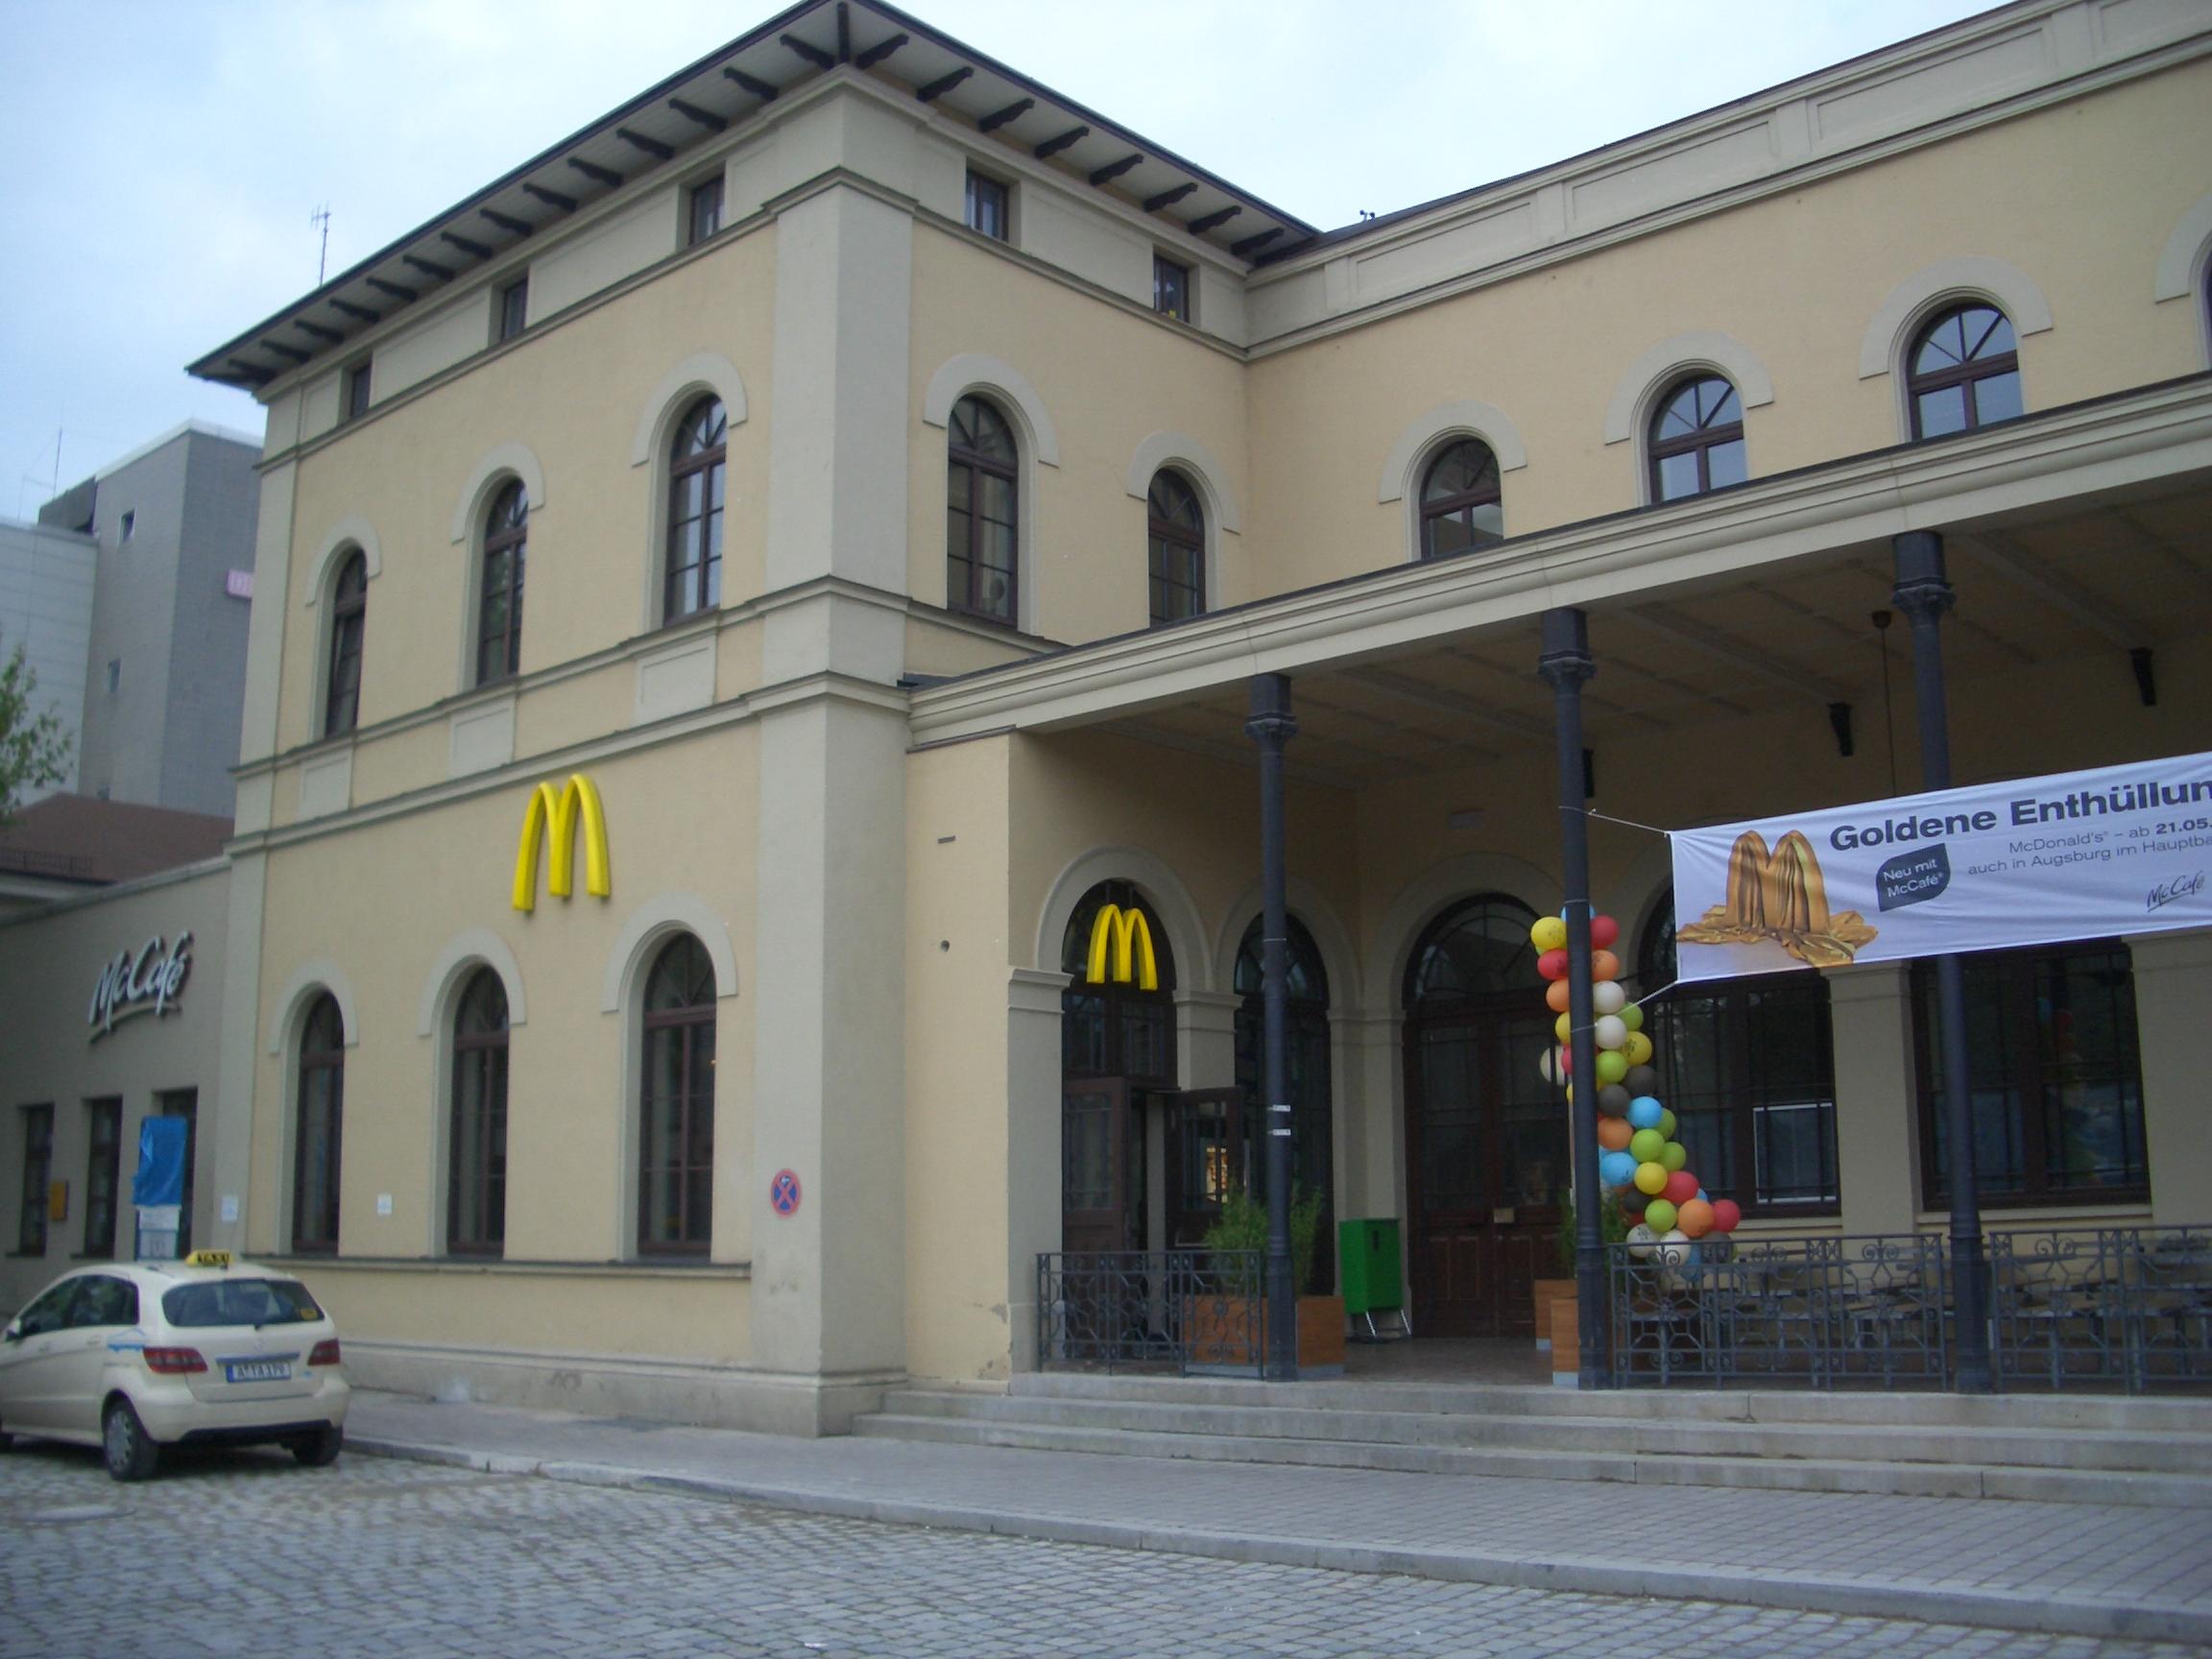 Mc Donald am Hbf Augsburg